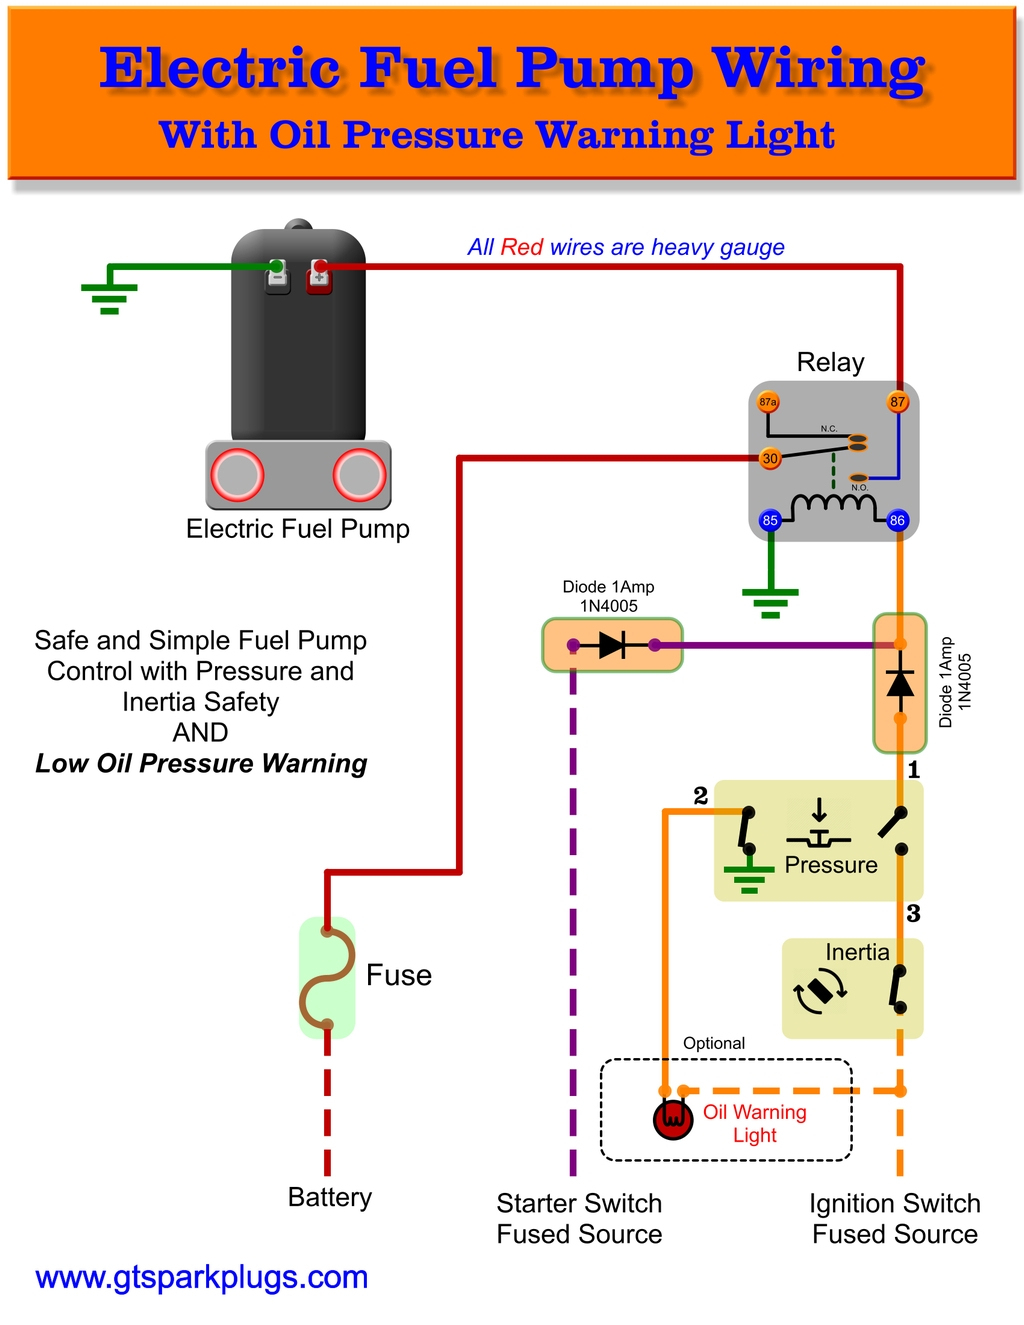 Electric Fuel Pump Wiring - Data Wiring Diagram Detailed - Electric Fuel Pump Wiring Diagram